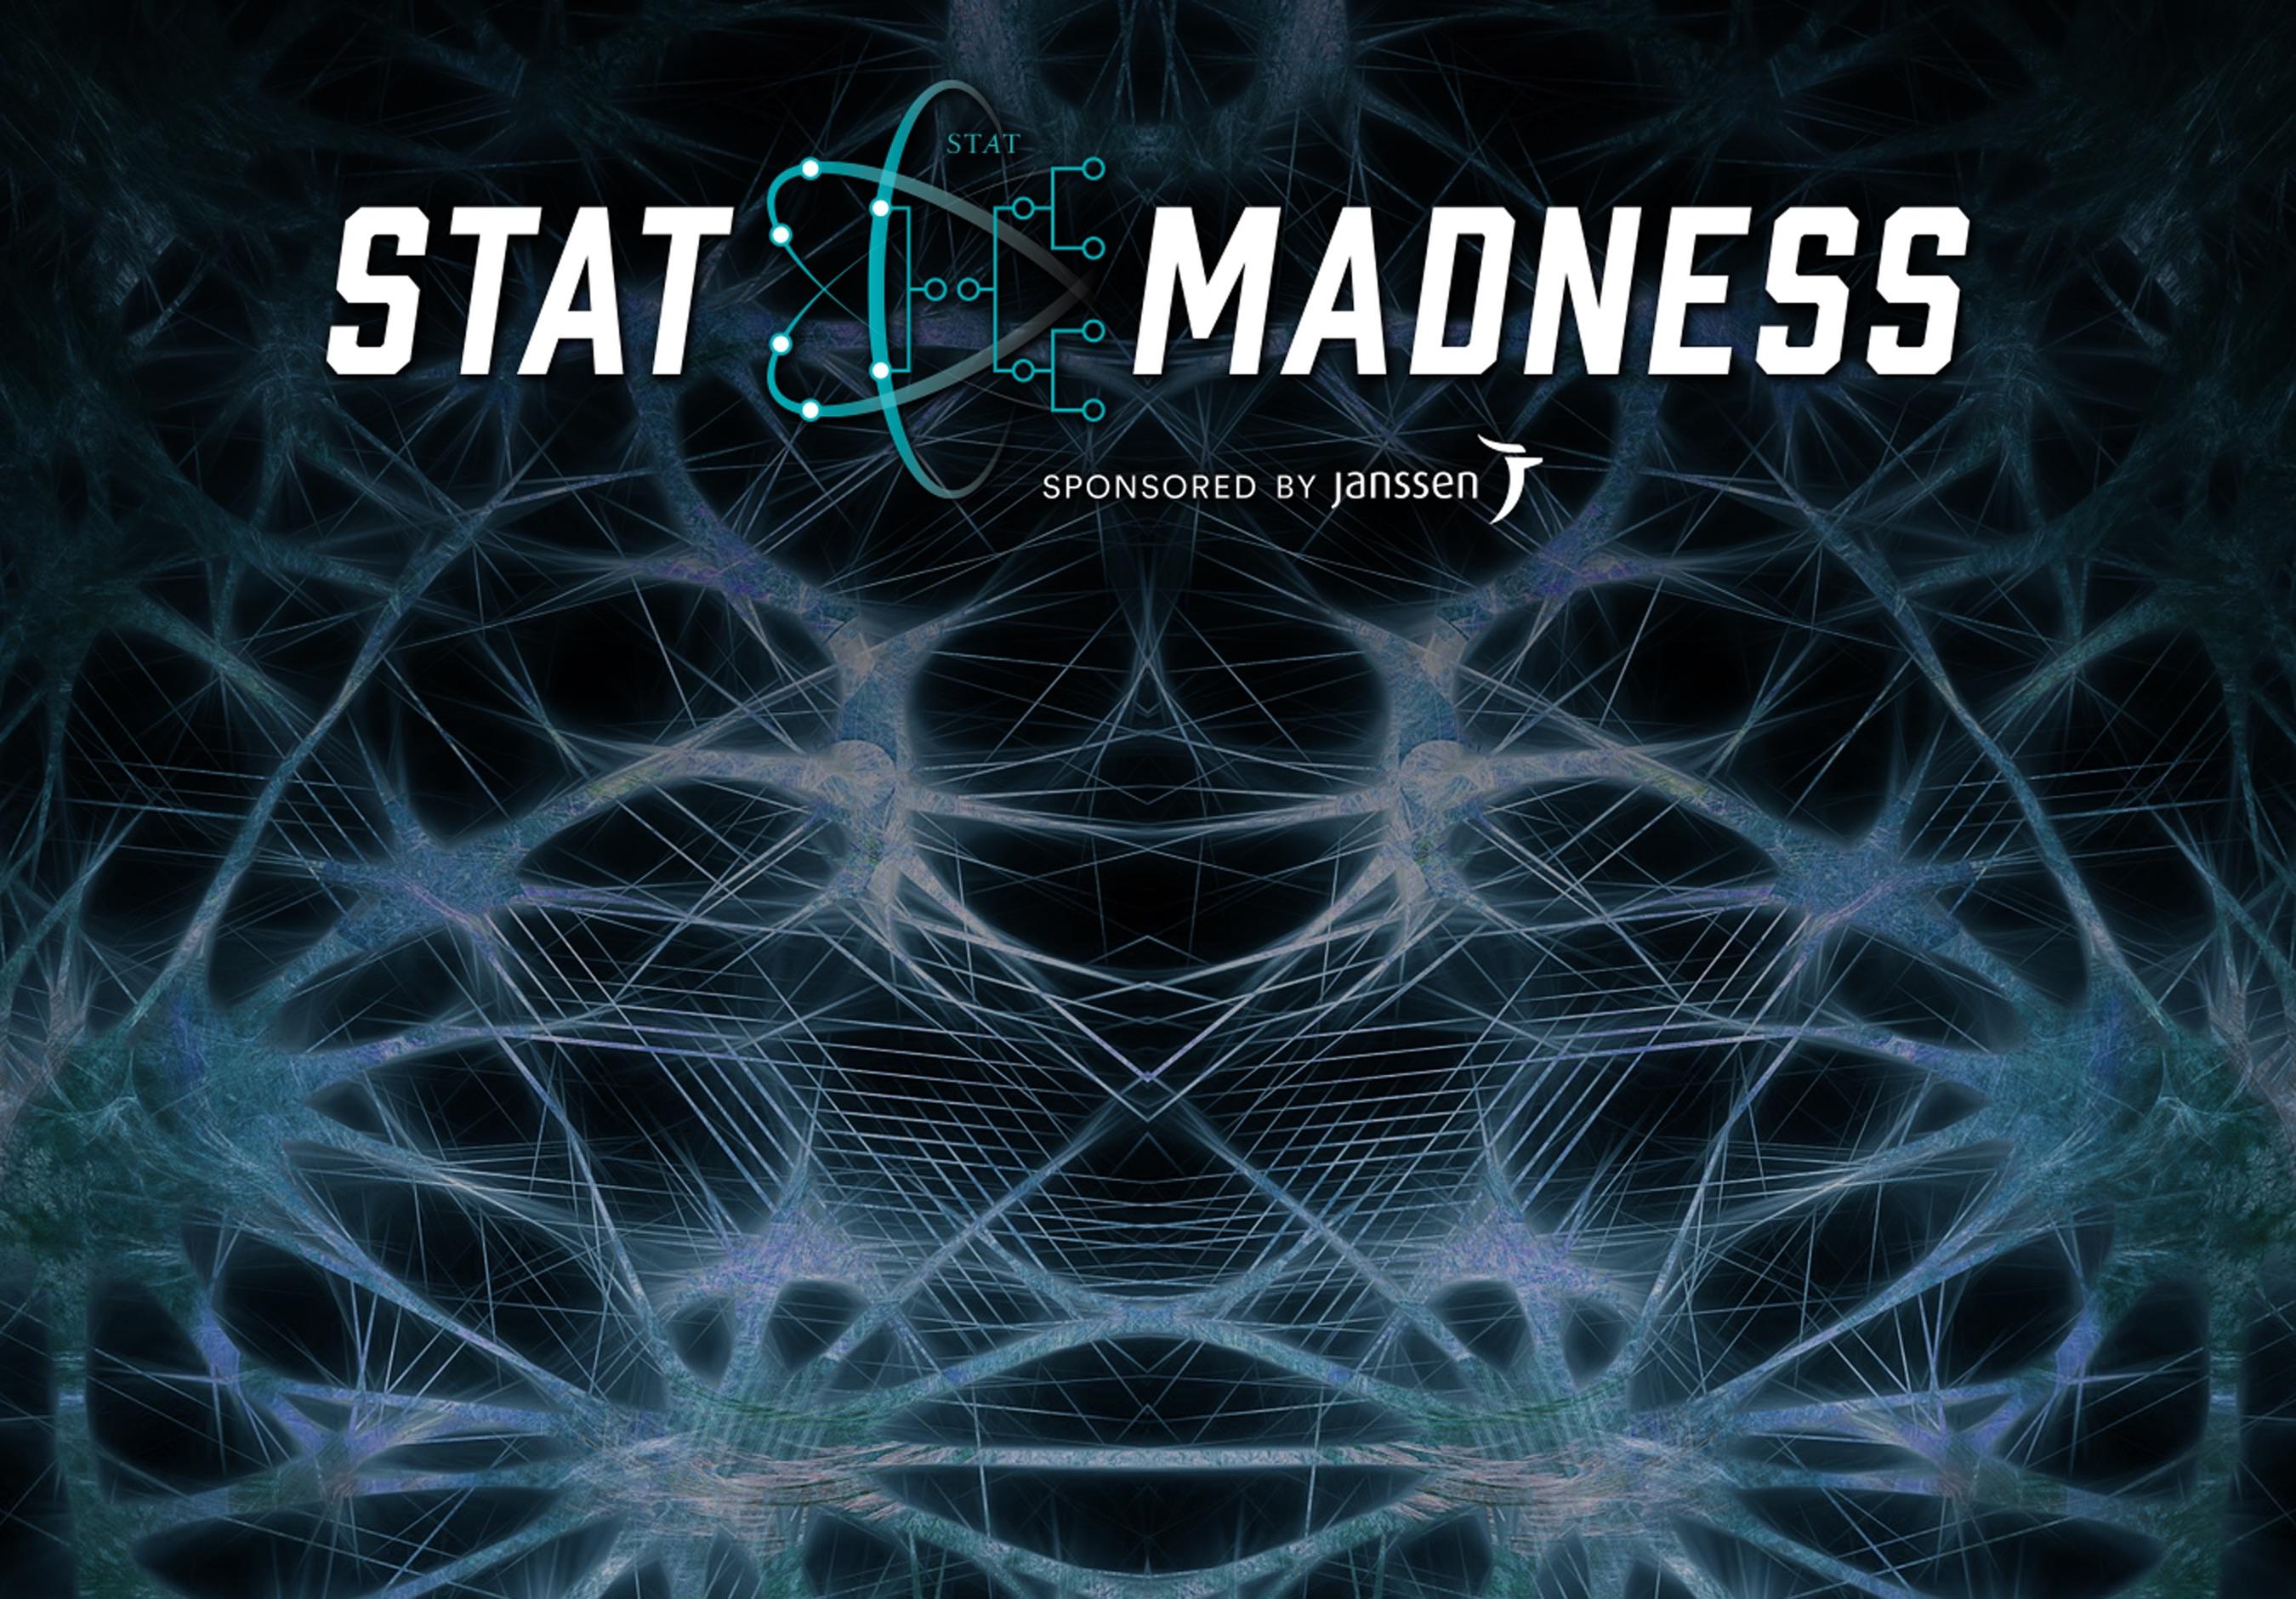 Stat madness